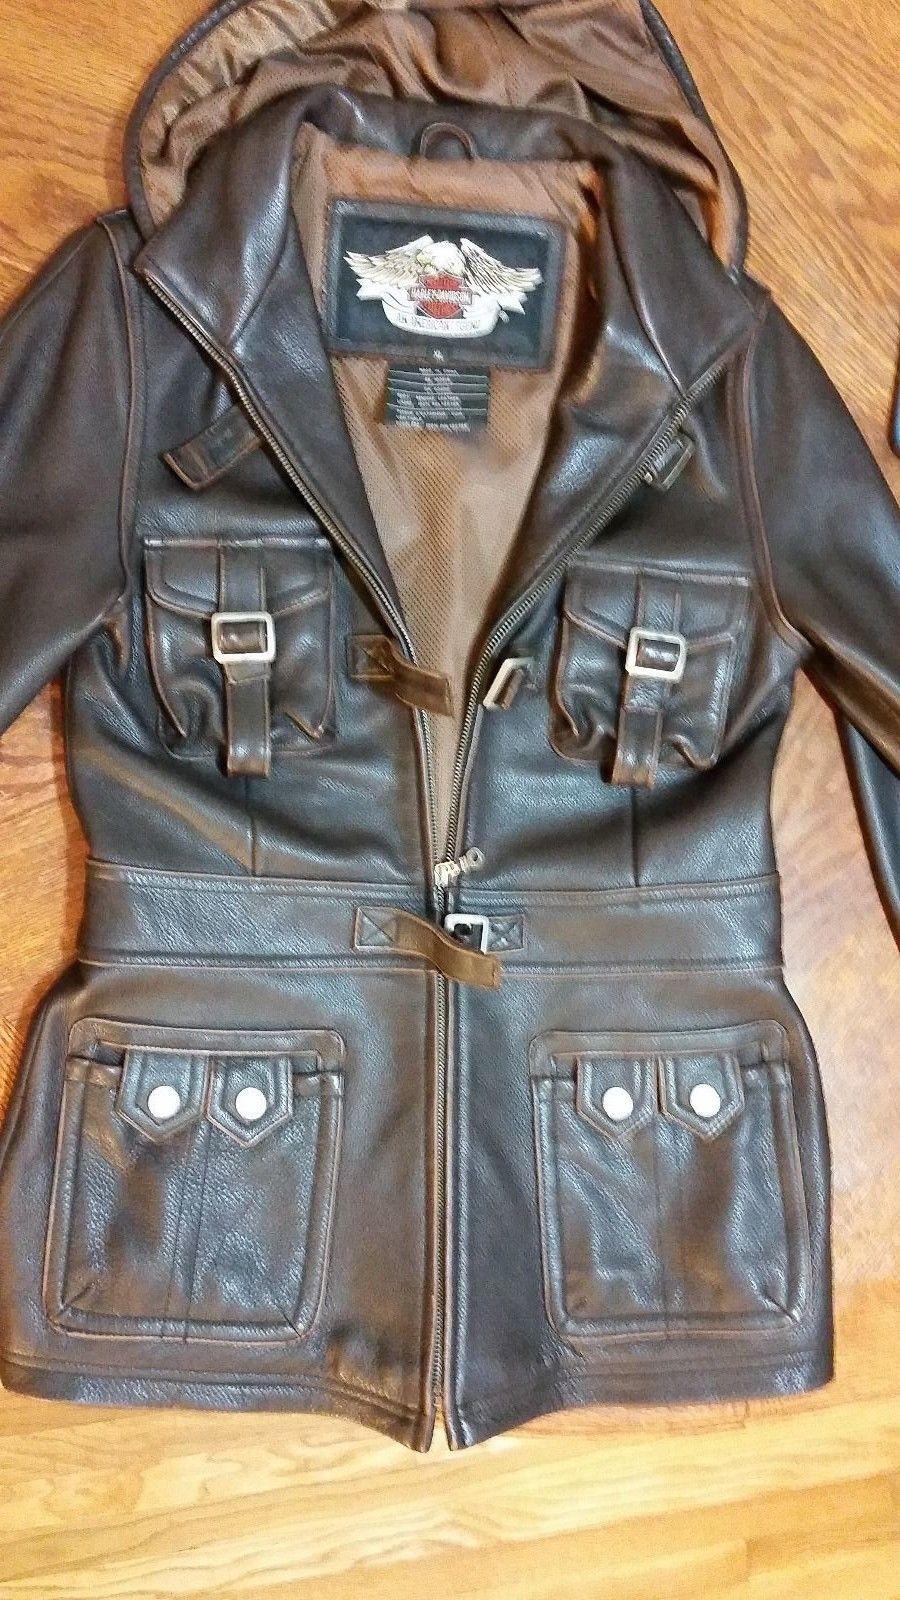 Harley Davidson Classic Genuine Leather Jacket Buckle With Hood Women Petit Xl Ebay Leather Jacket Harley Davidson Leather Jackets Brown Leather Jacket [ 1600 x 900 Pixel ]